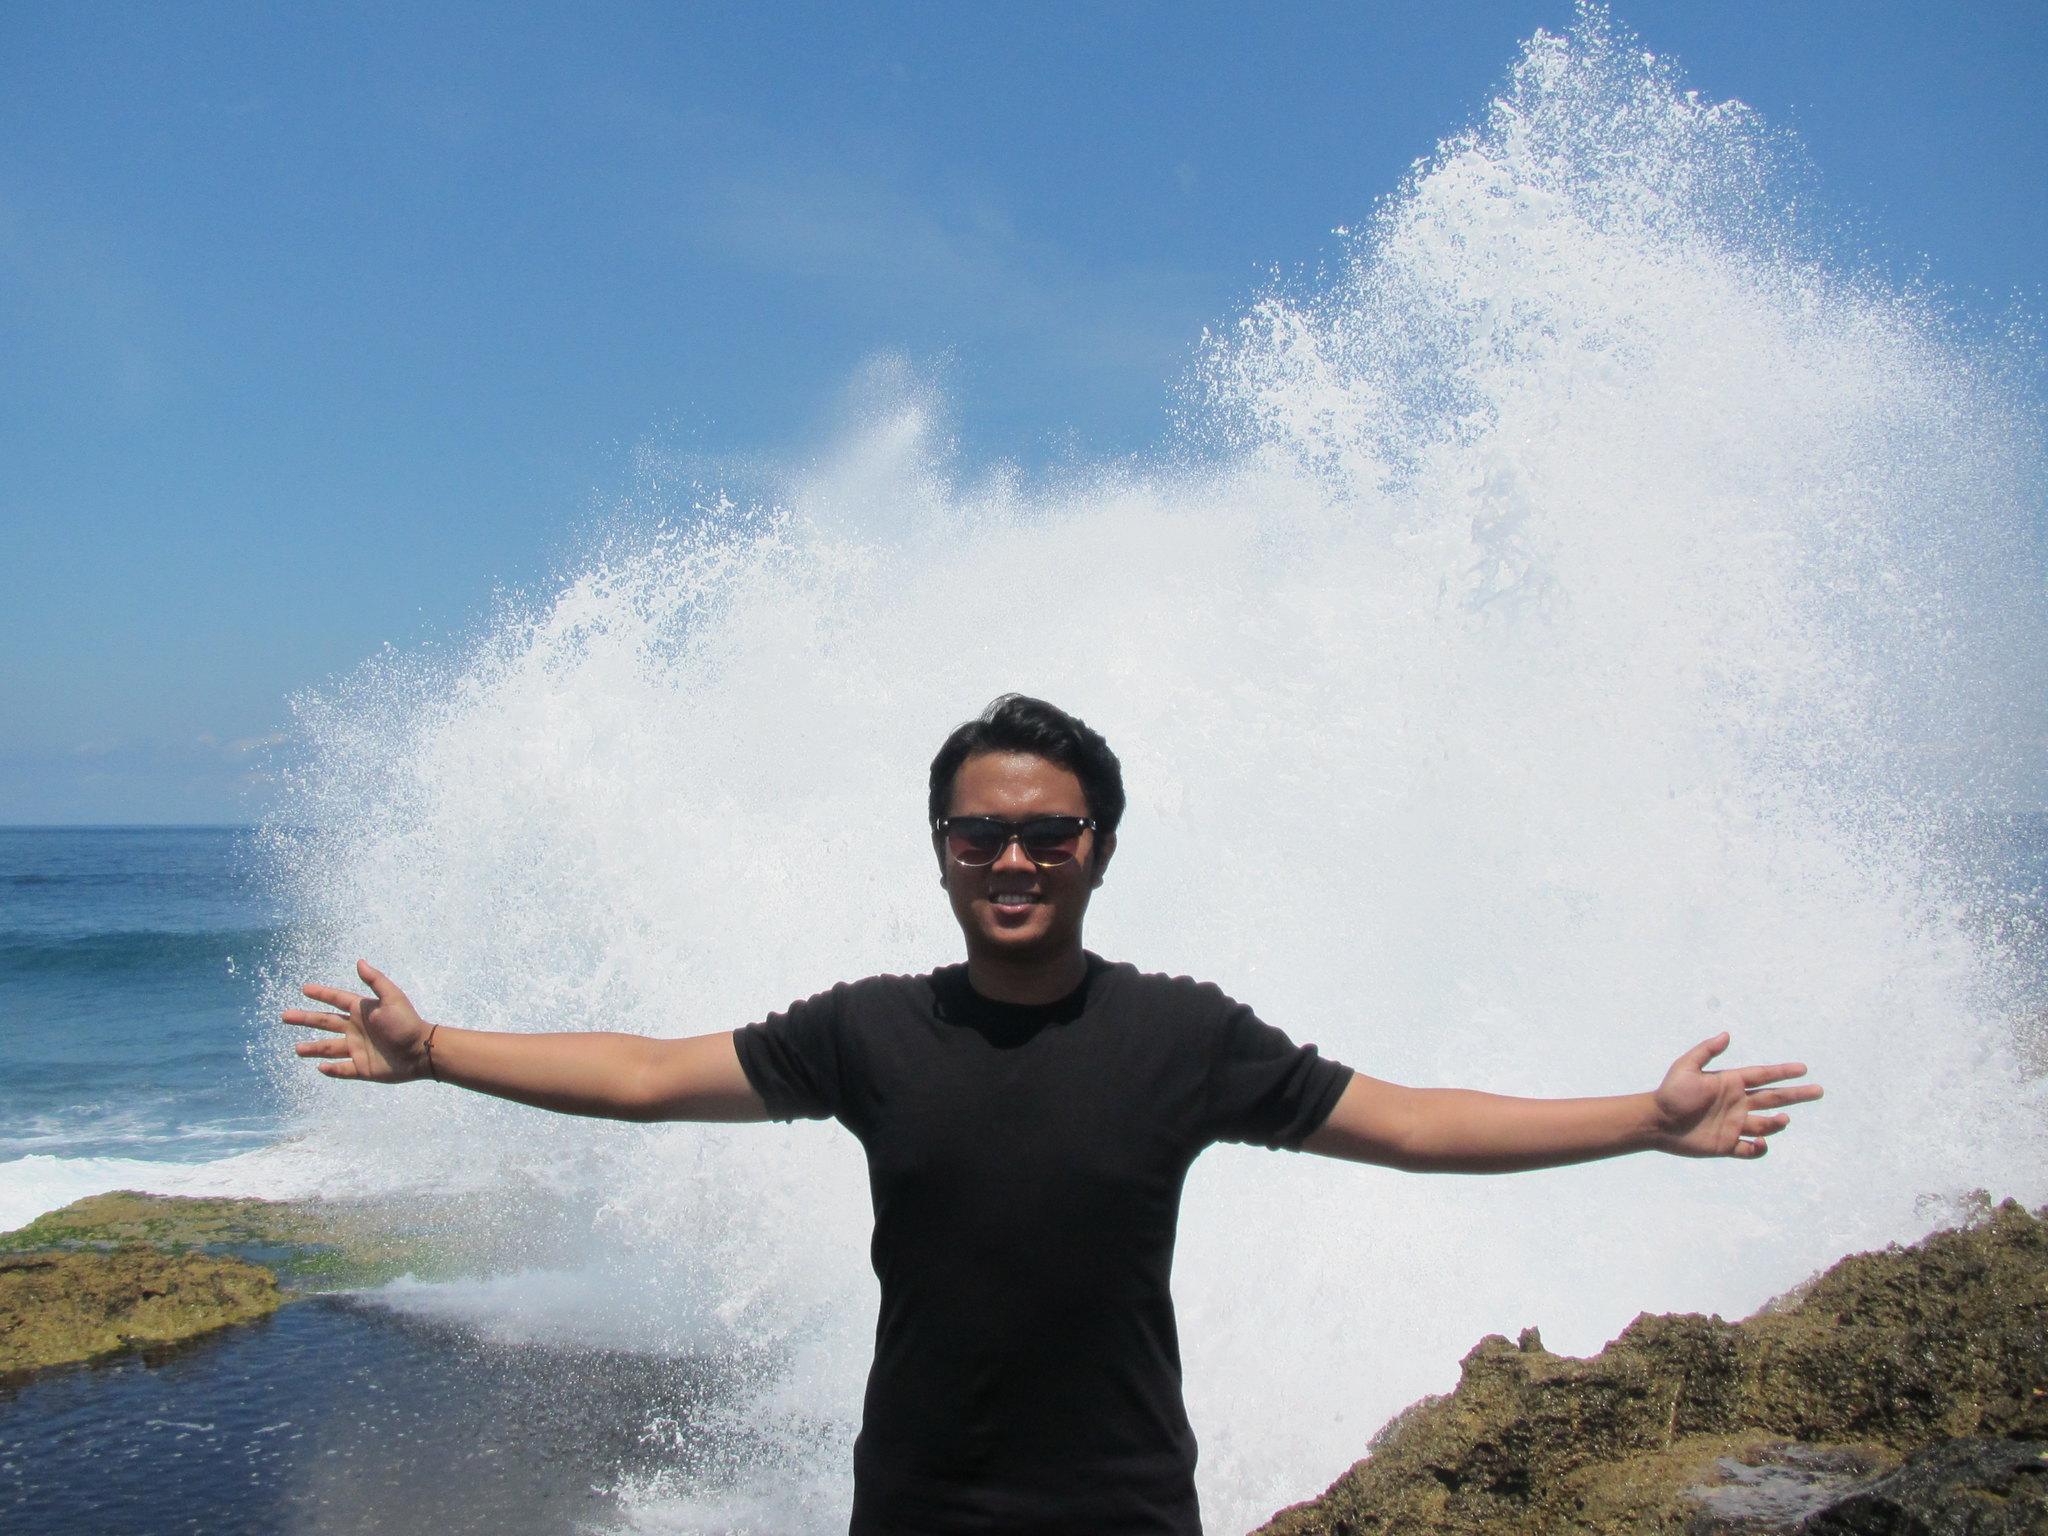 Kabur ke Nusa Lembongan 4